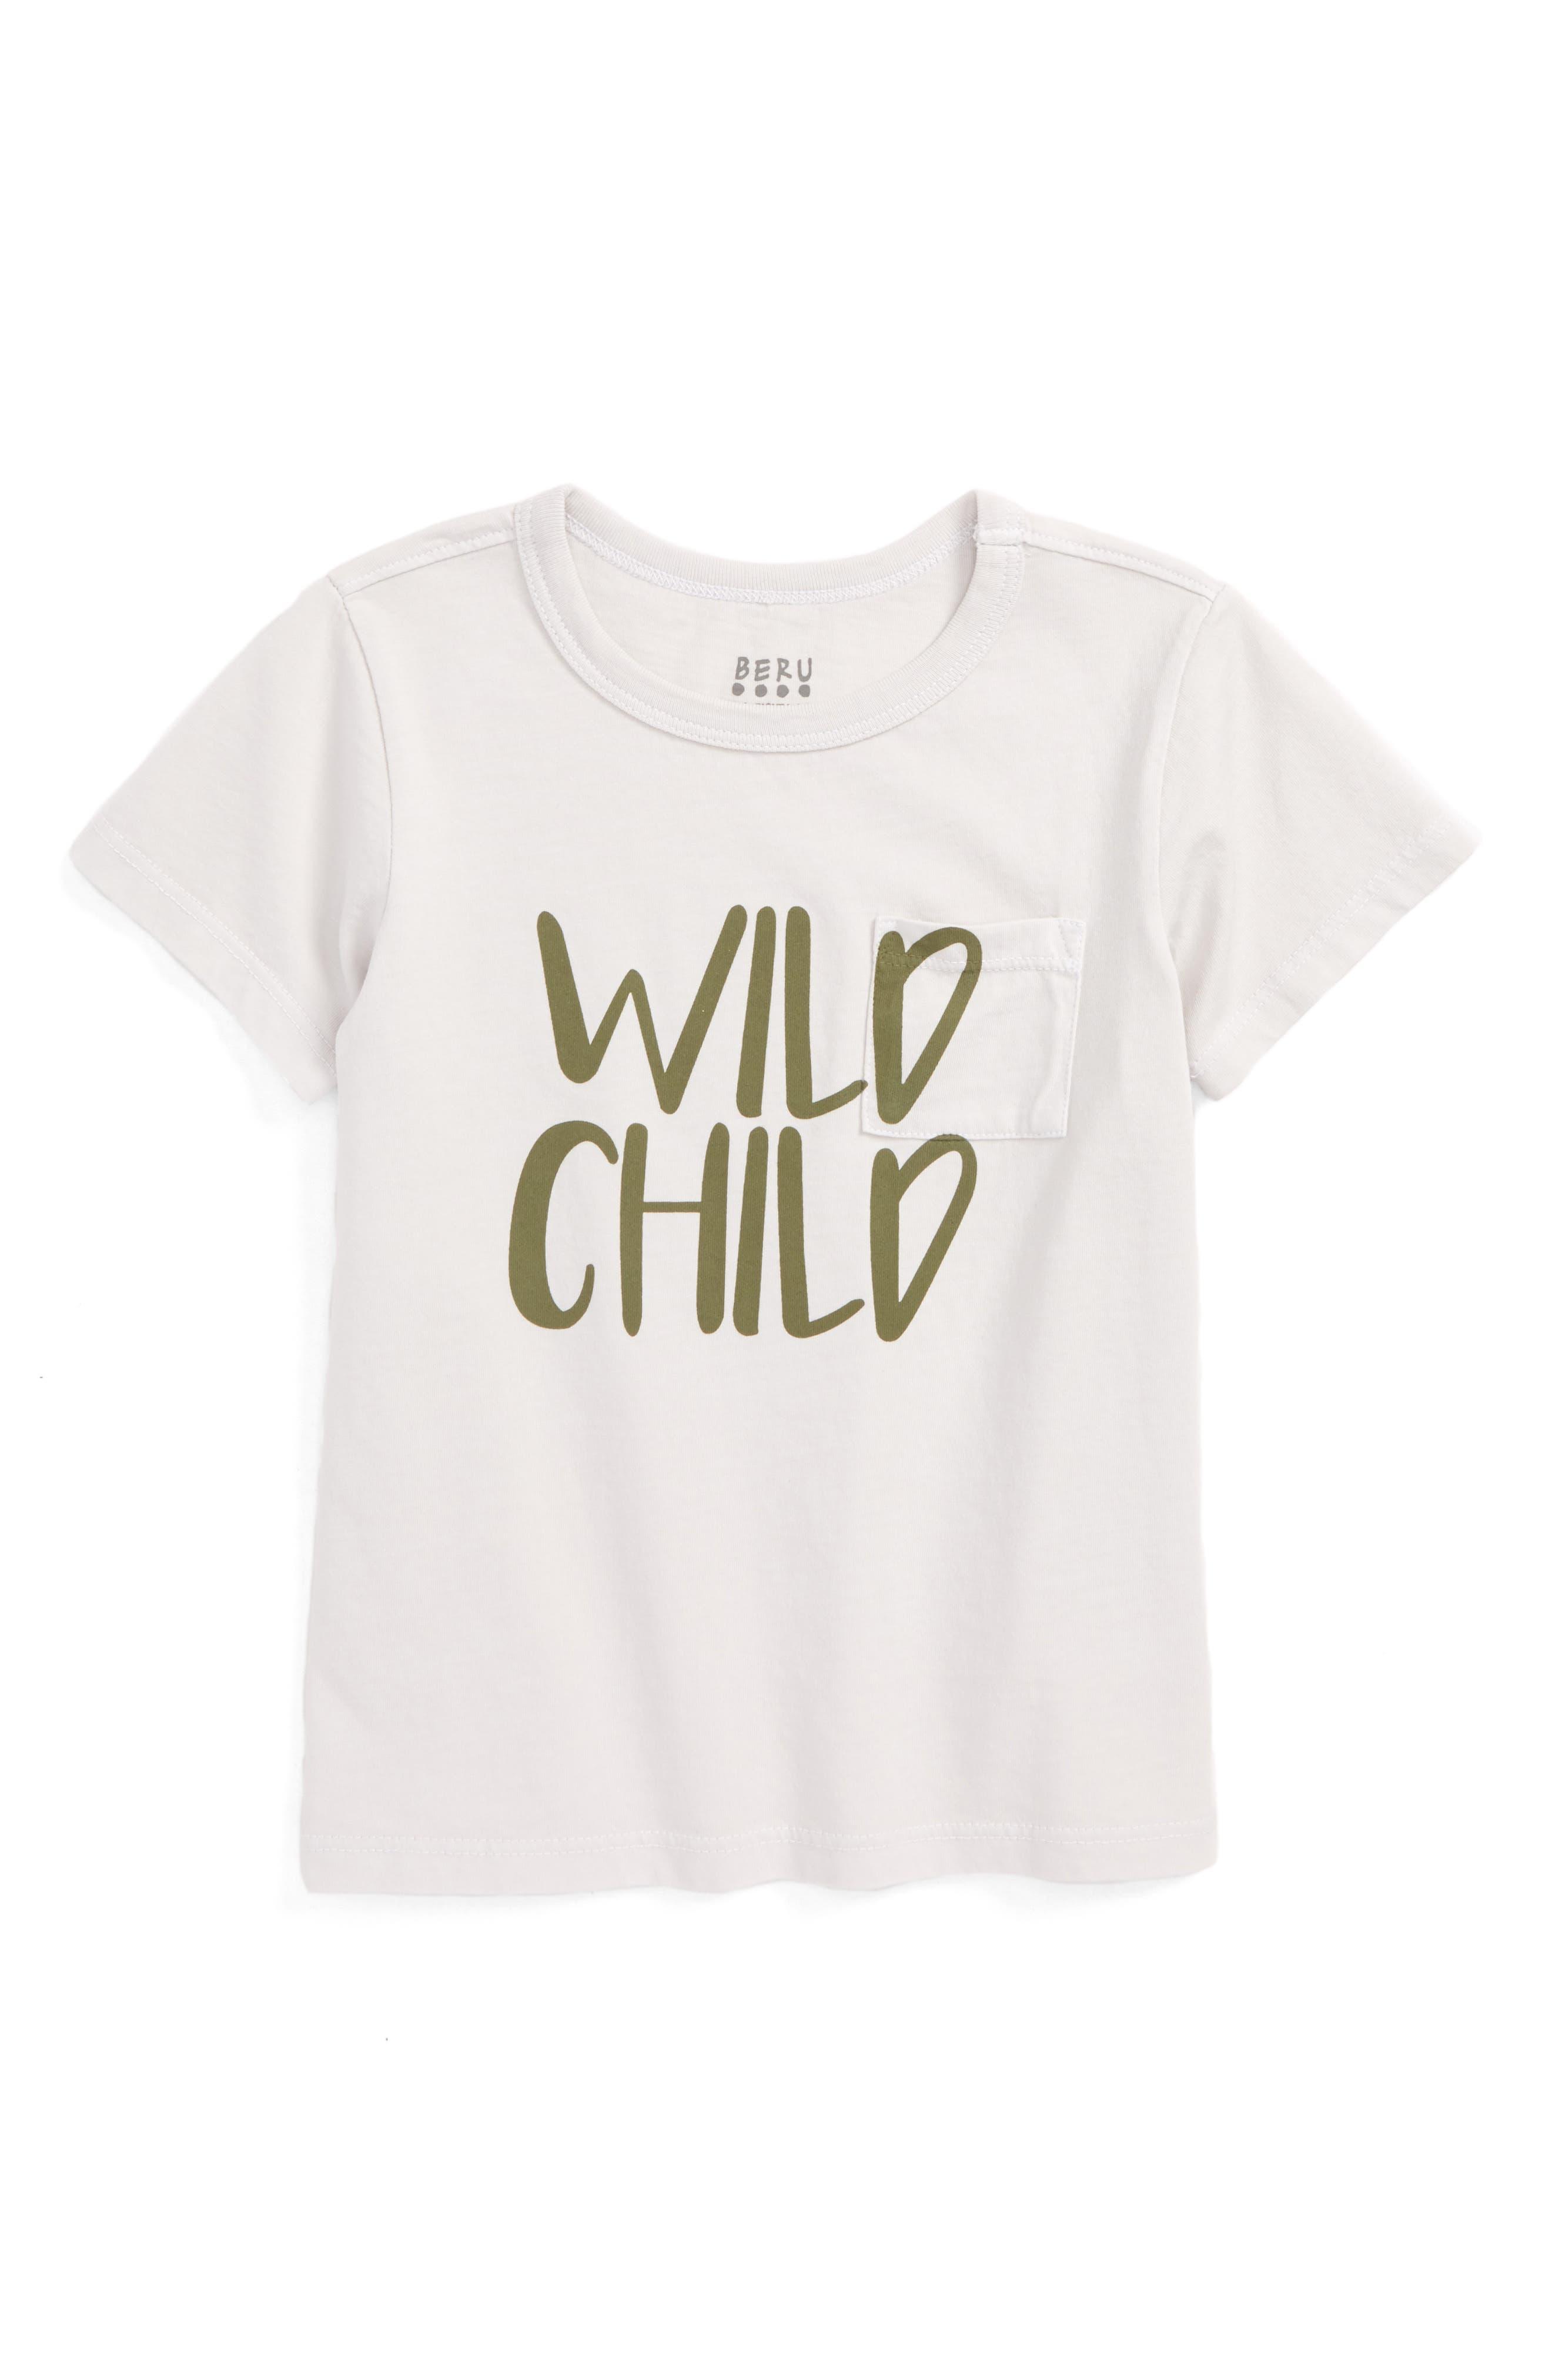 Huxley - Wild Child Organic Cotton T-Shirt,                             Main thumbnail 1, color,                             250